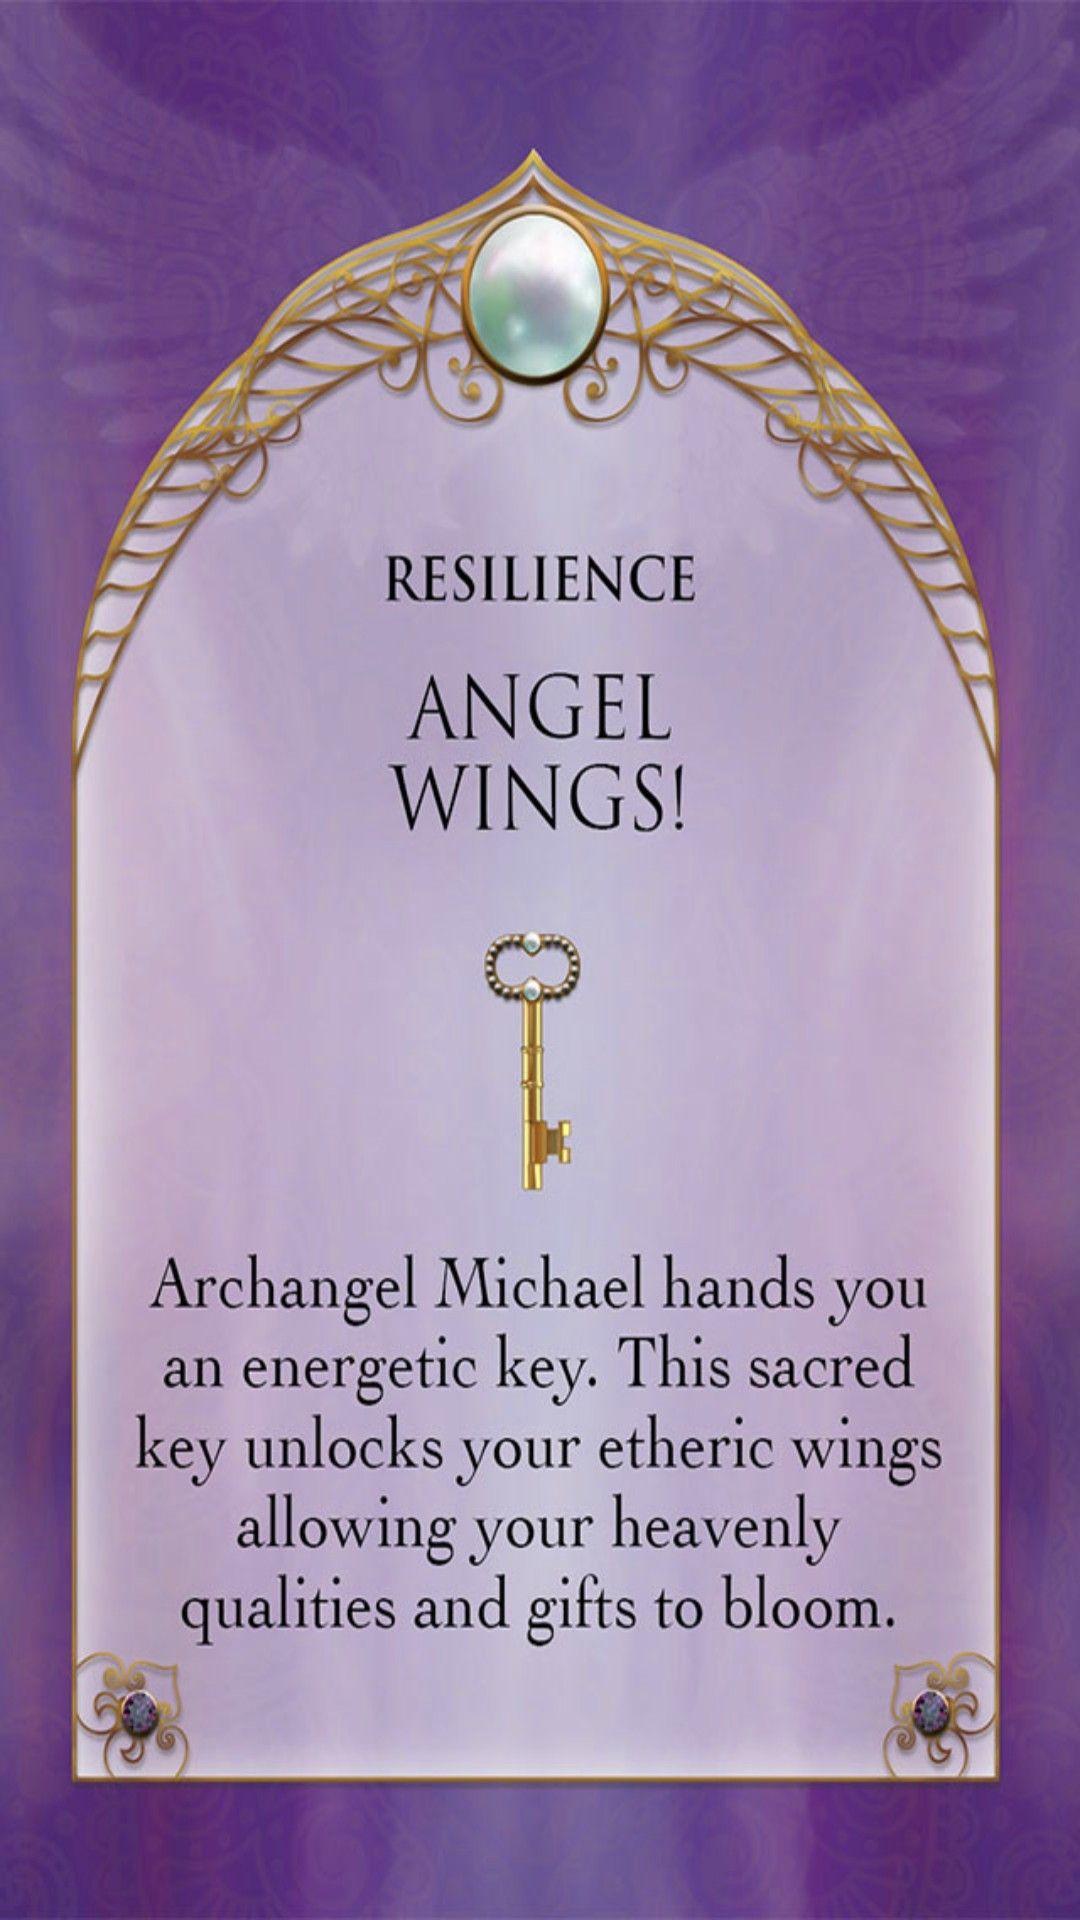 Archangel Michael Sword & Shield Oracle ~ Resilience   Angel